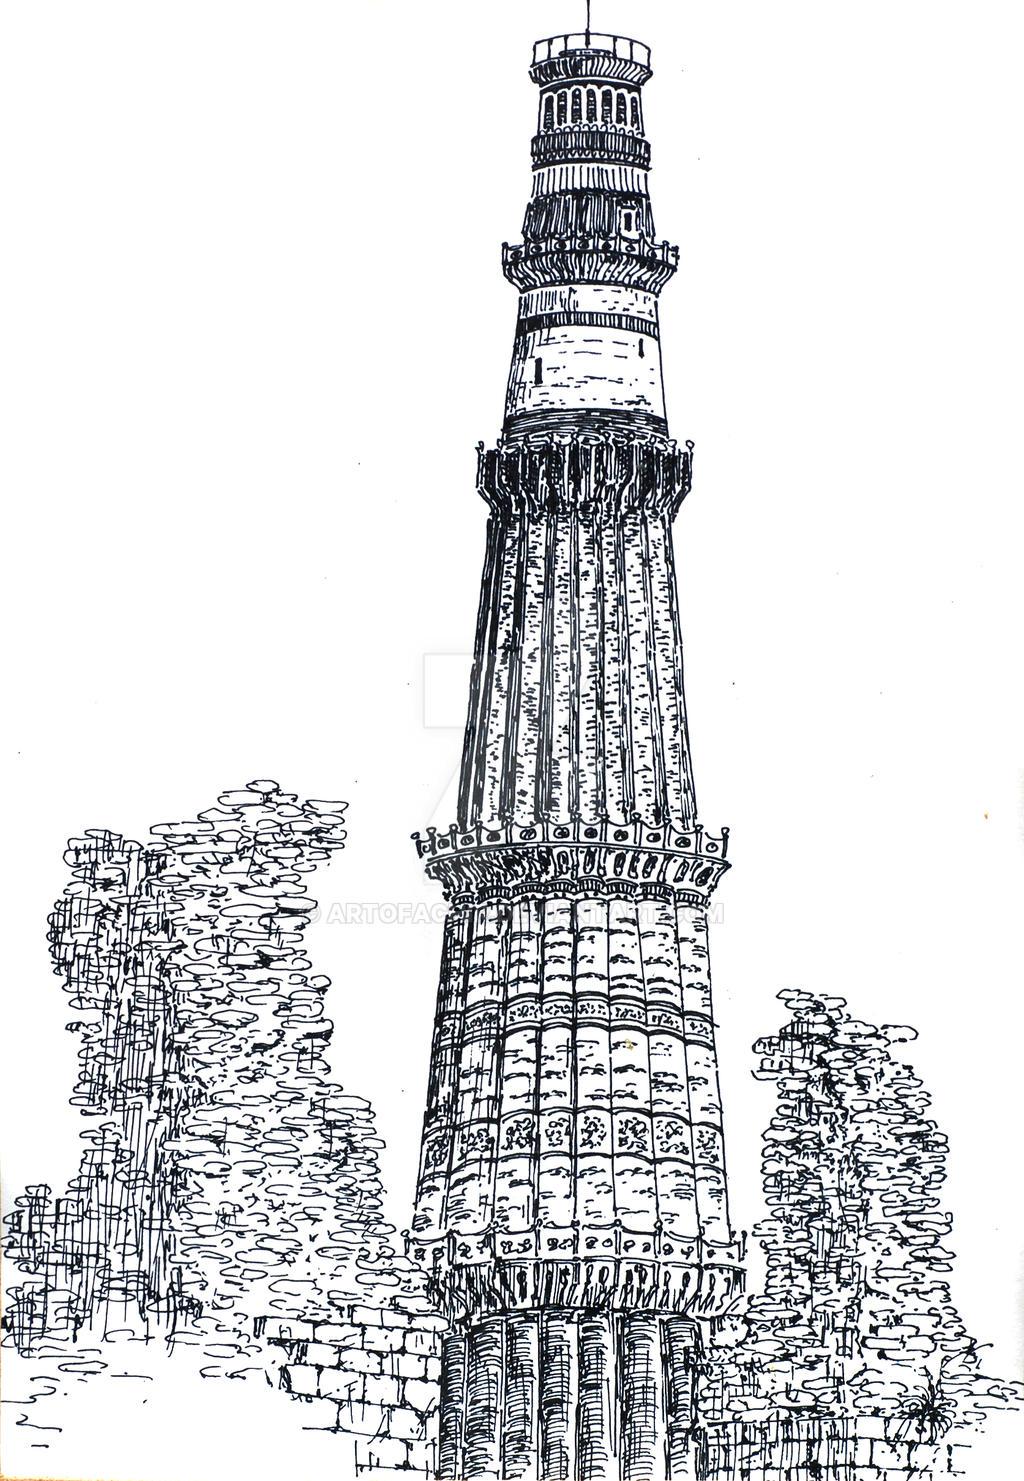 Kutub minar by artofachir kutub minar by artofachir